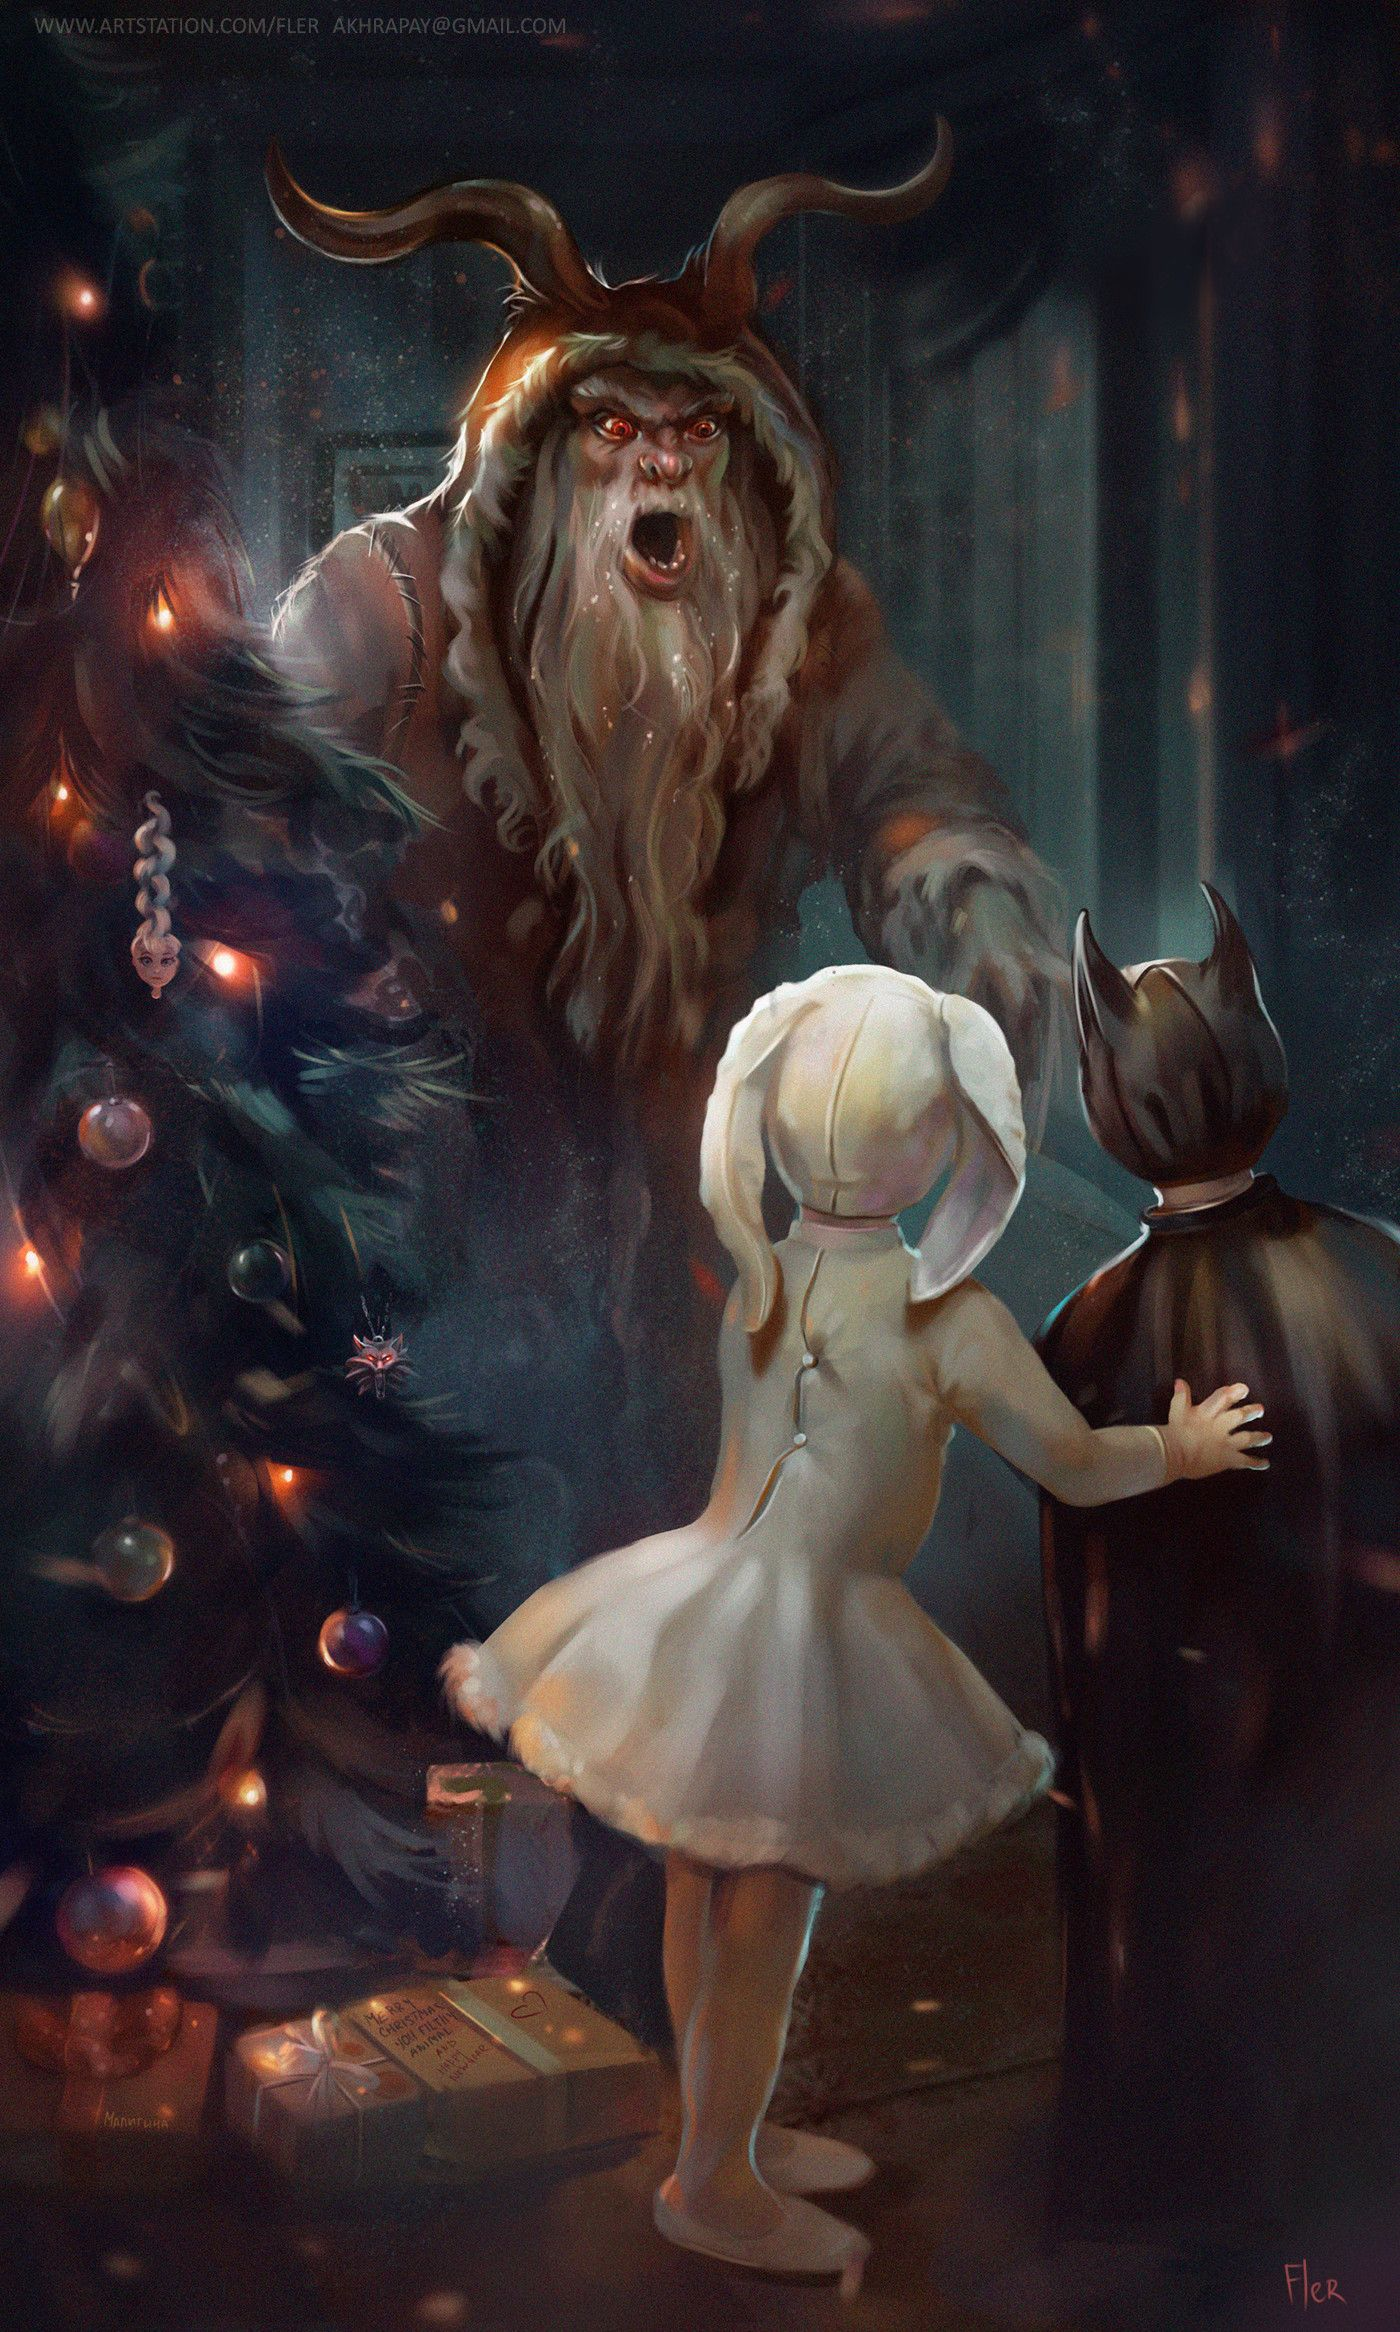 Krampus Krampus Abducts Children Christmas Illustration Christmas Art Children In Carnival Costumes Bo Holiday Illustrations New Year Art Creepy Christmas